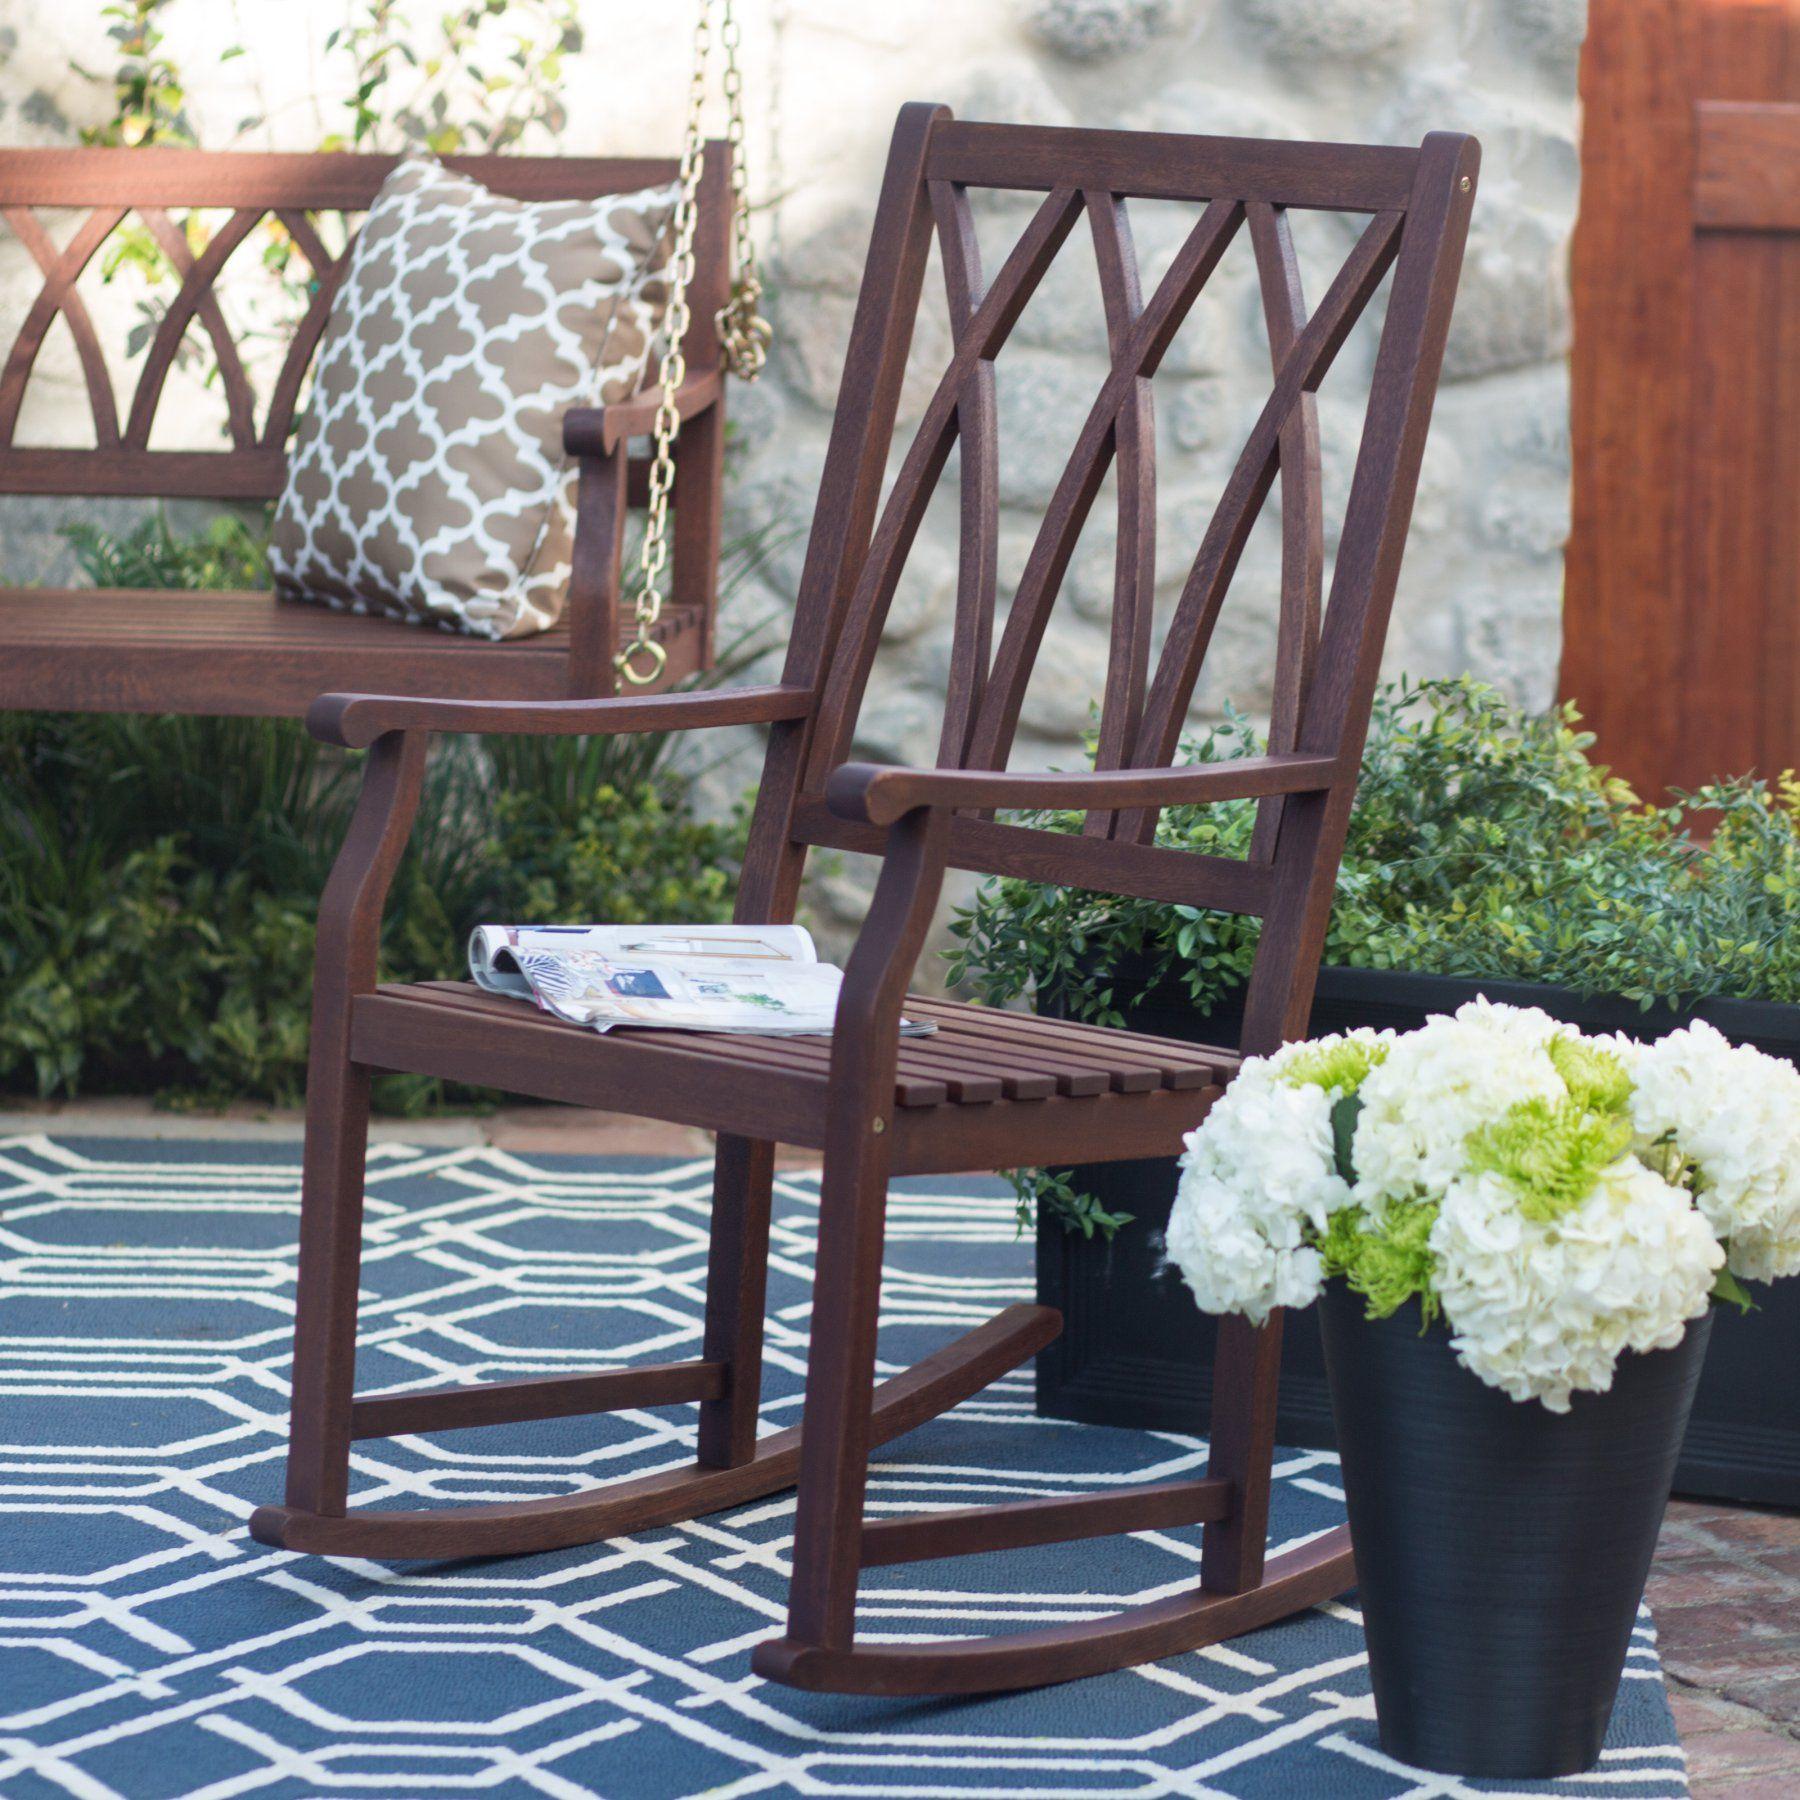 Belham living ashbury indooroutdoor wood rocking chair dark brown